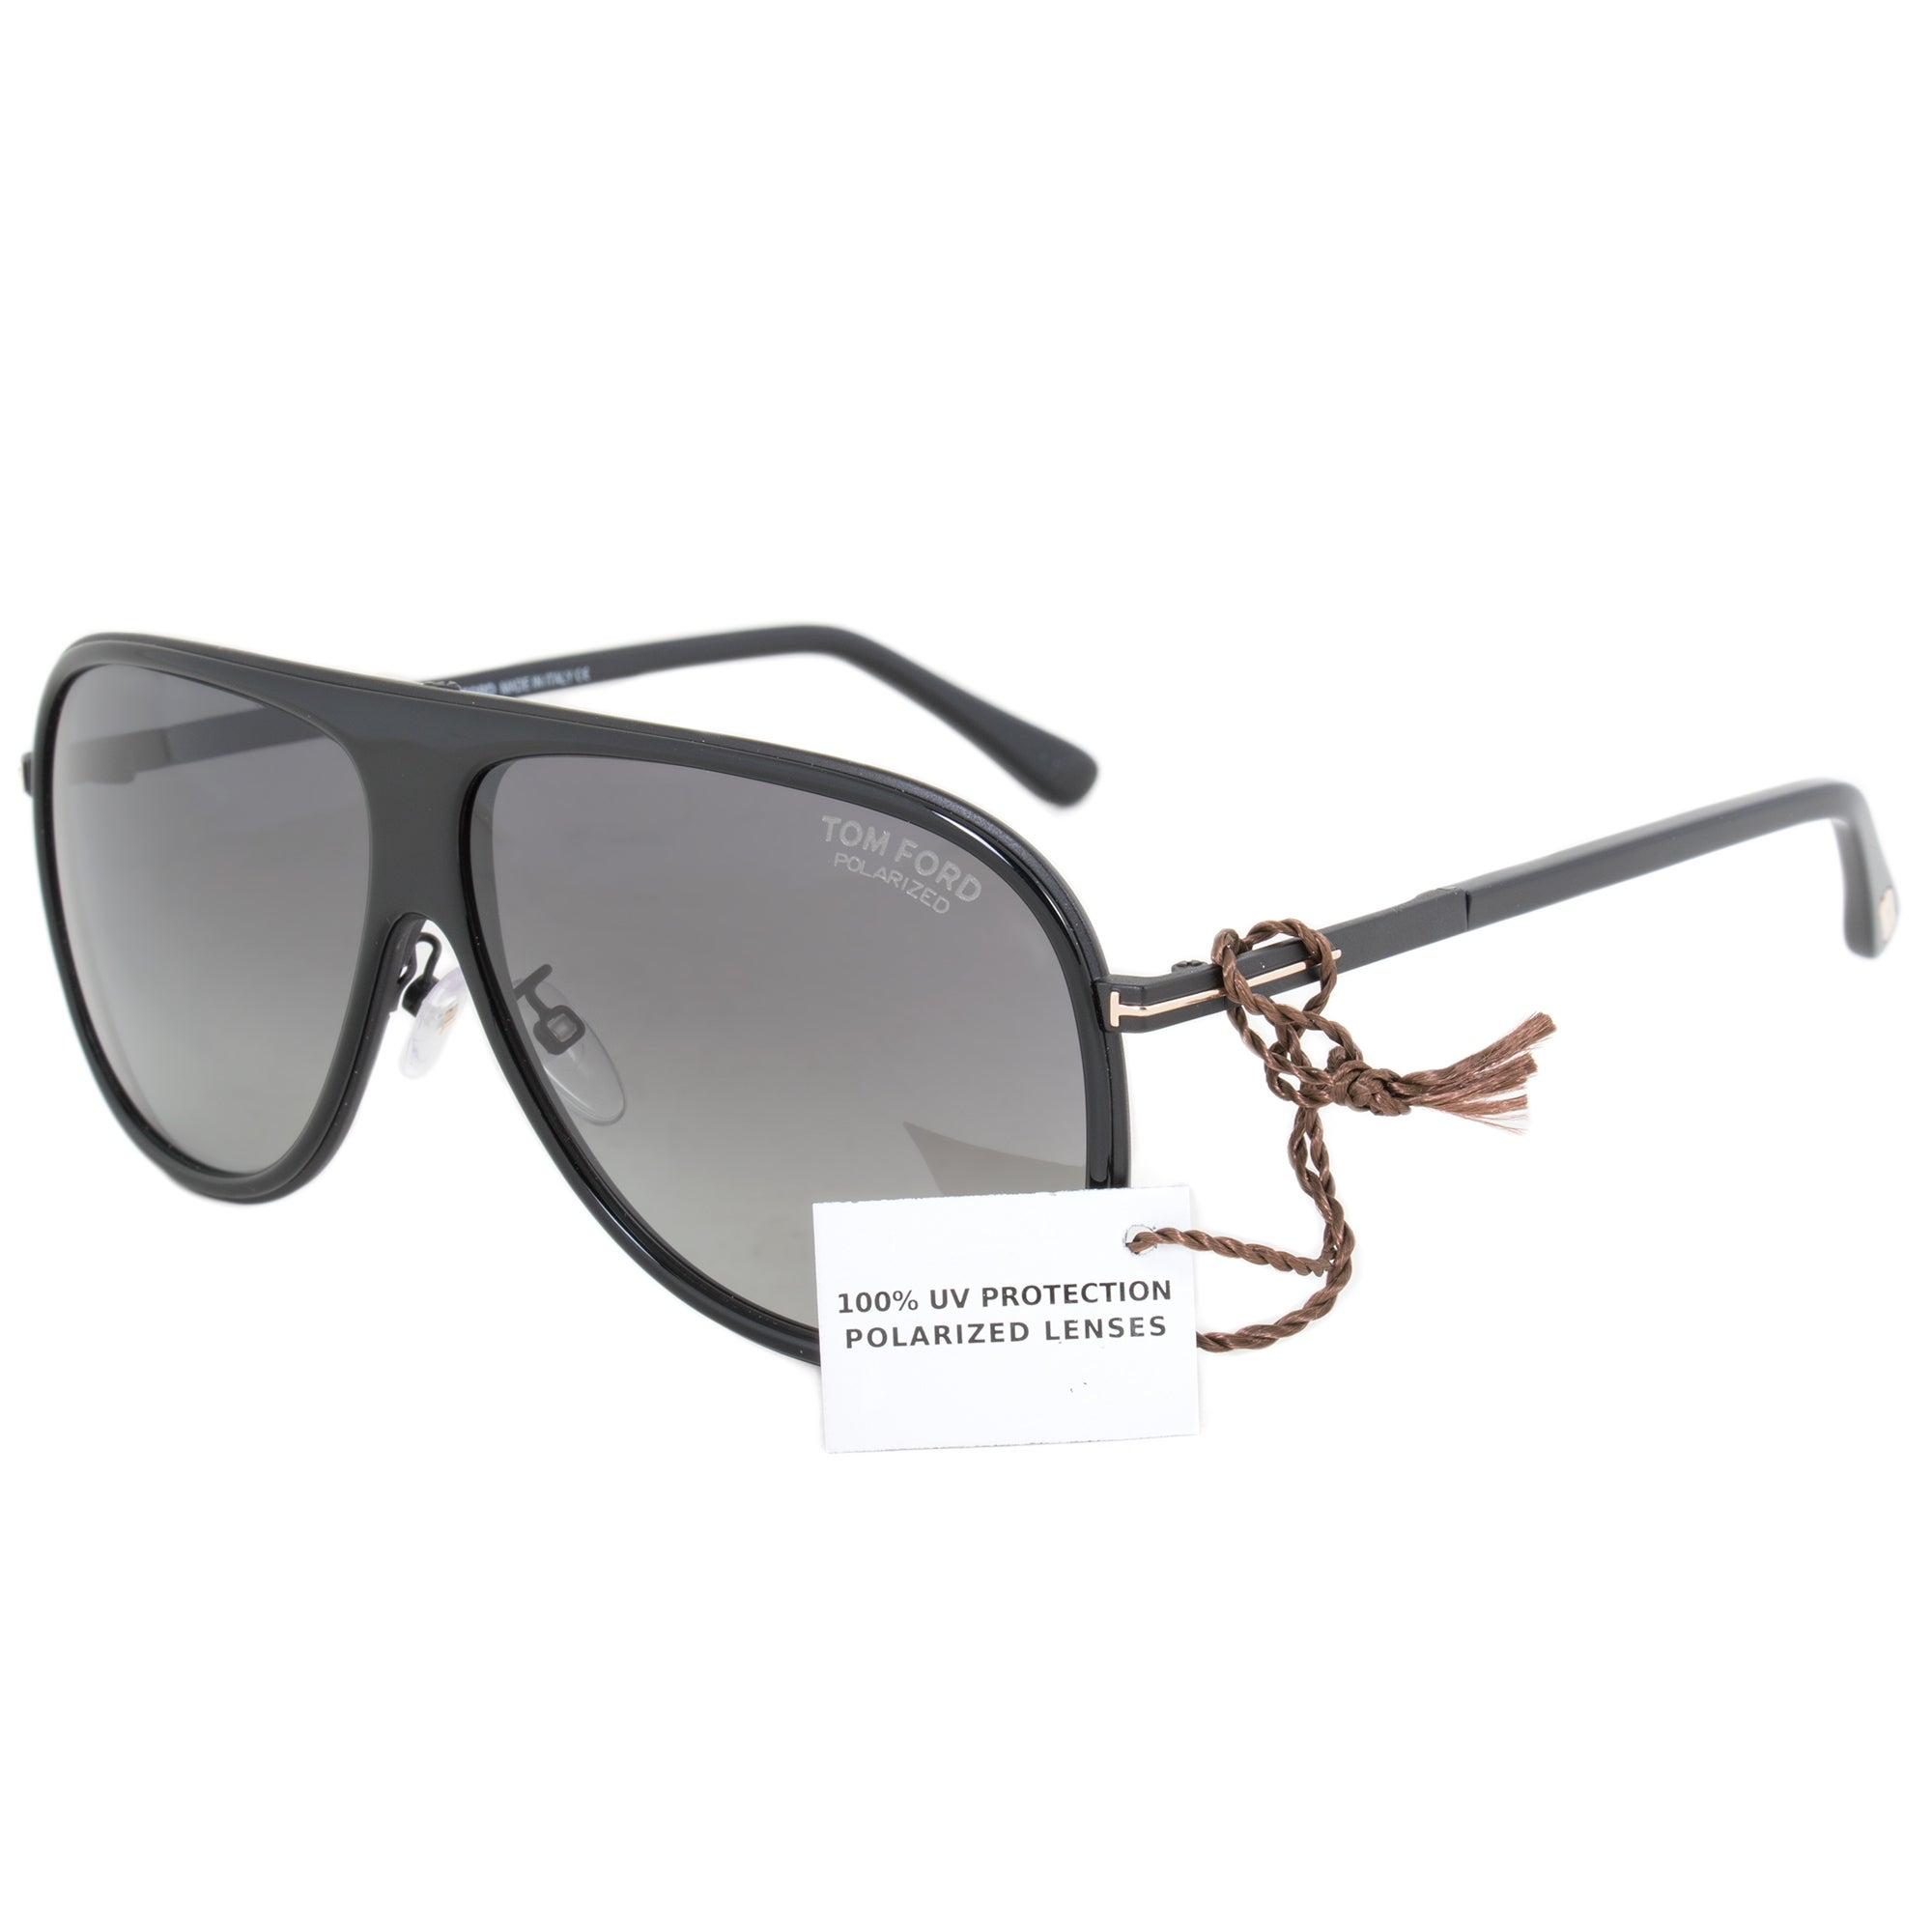 74bac2ecdc Shop Tom Ford FT0462F 01D Polarized Sunglasses - On Sale - Free ...